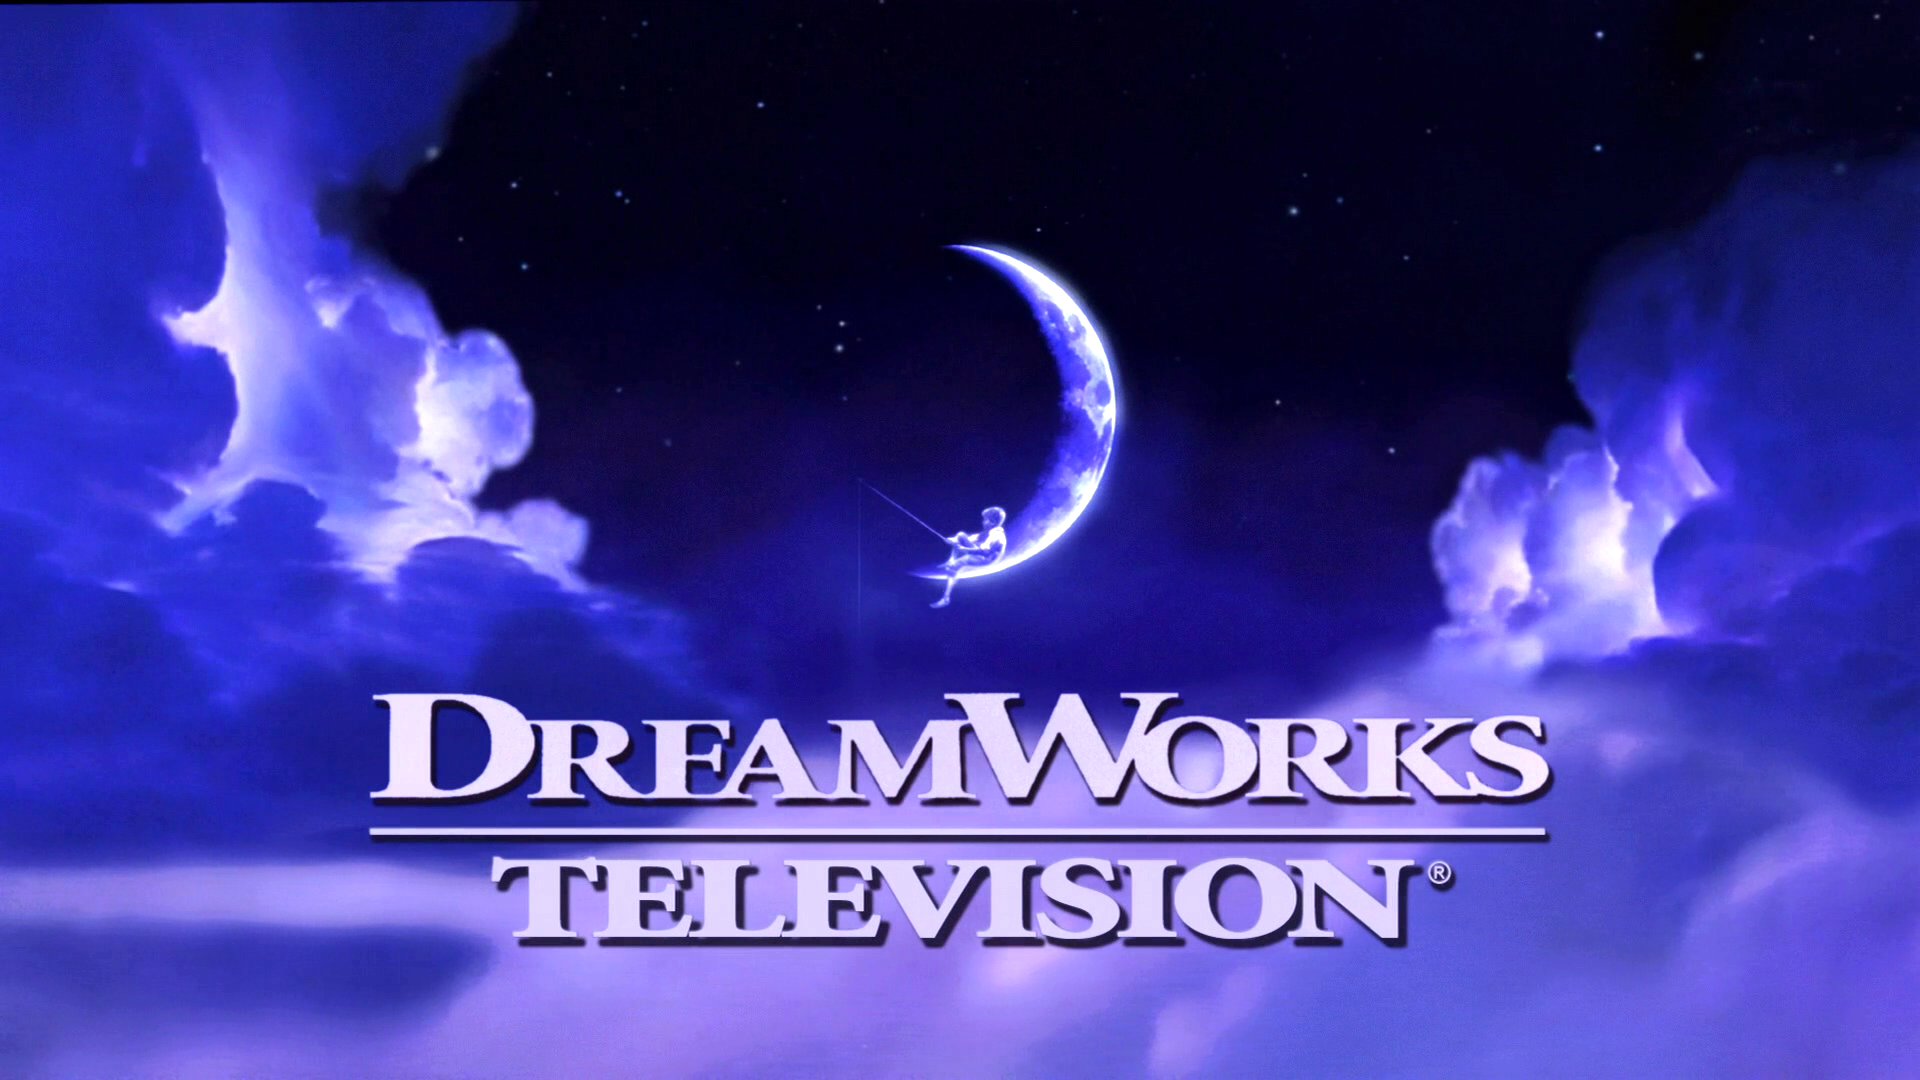 dreamworks animation Dreamworks animation skg logo 2004-2010 on scratch by newtristartails2014.